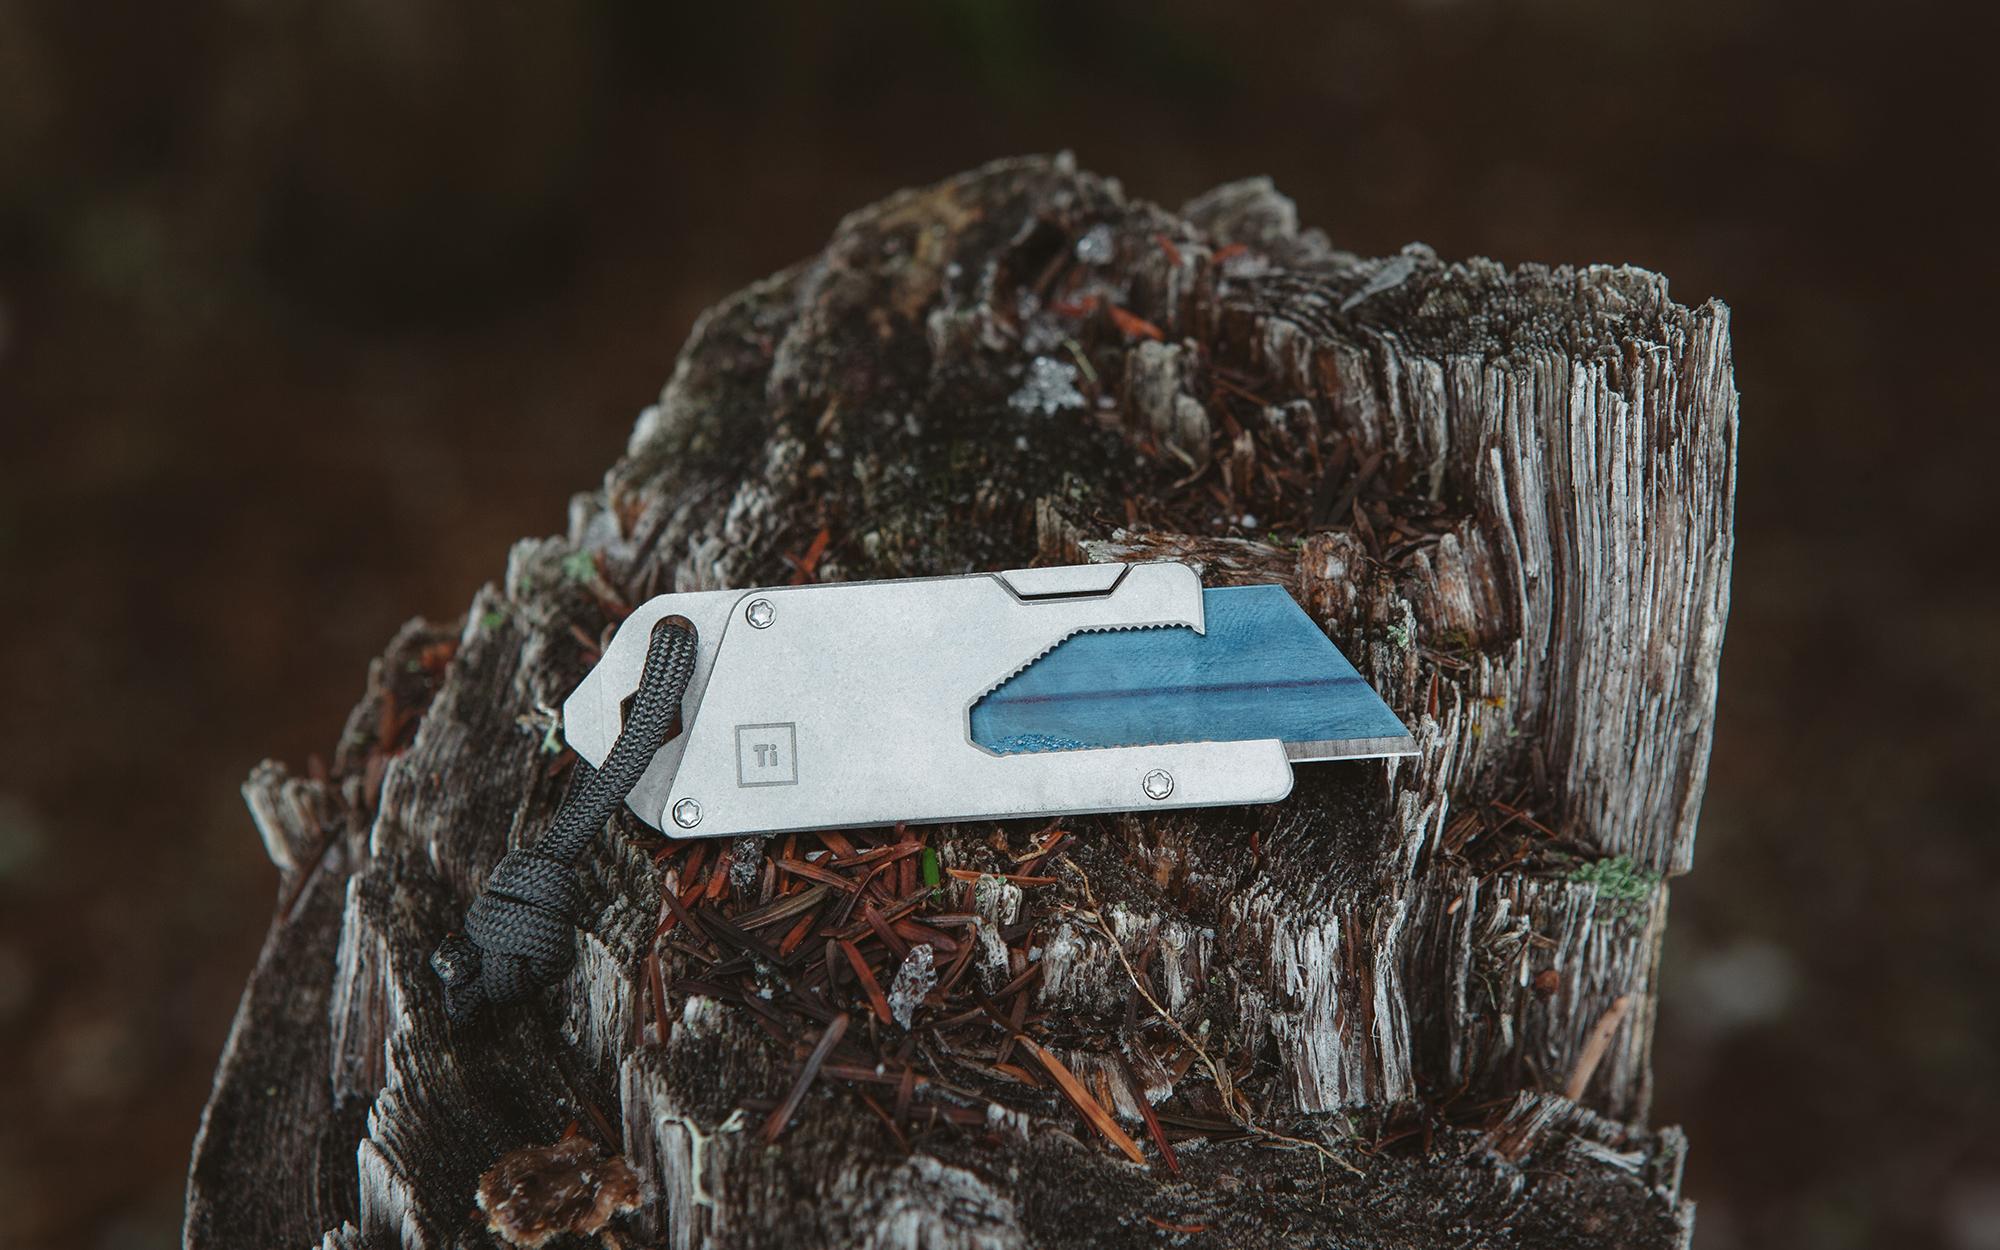 TPT (Titanium Pocket Tool)